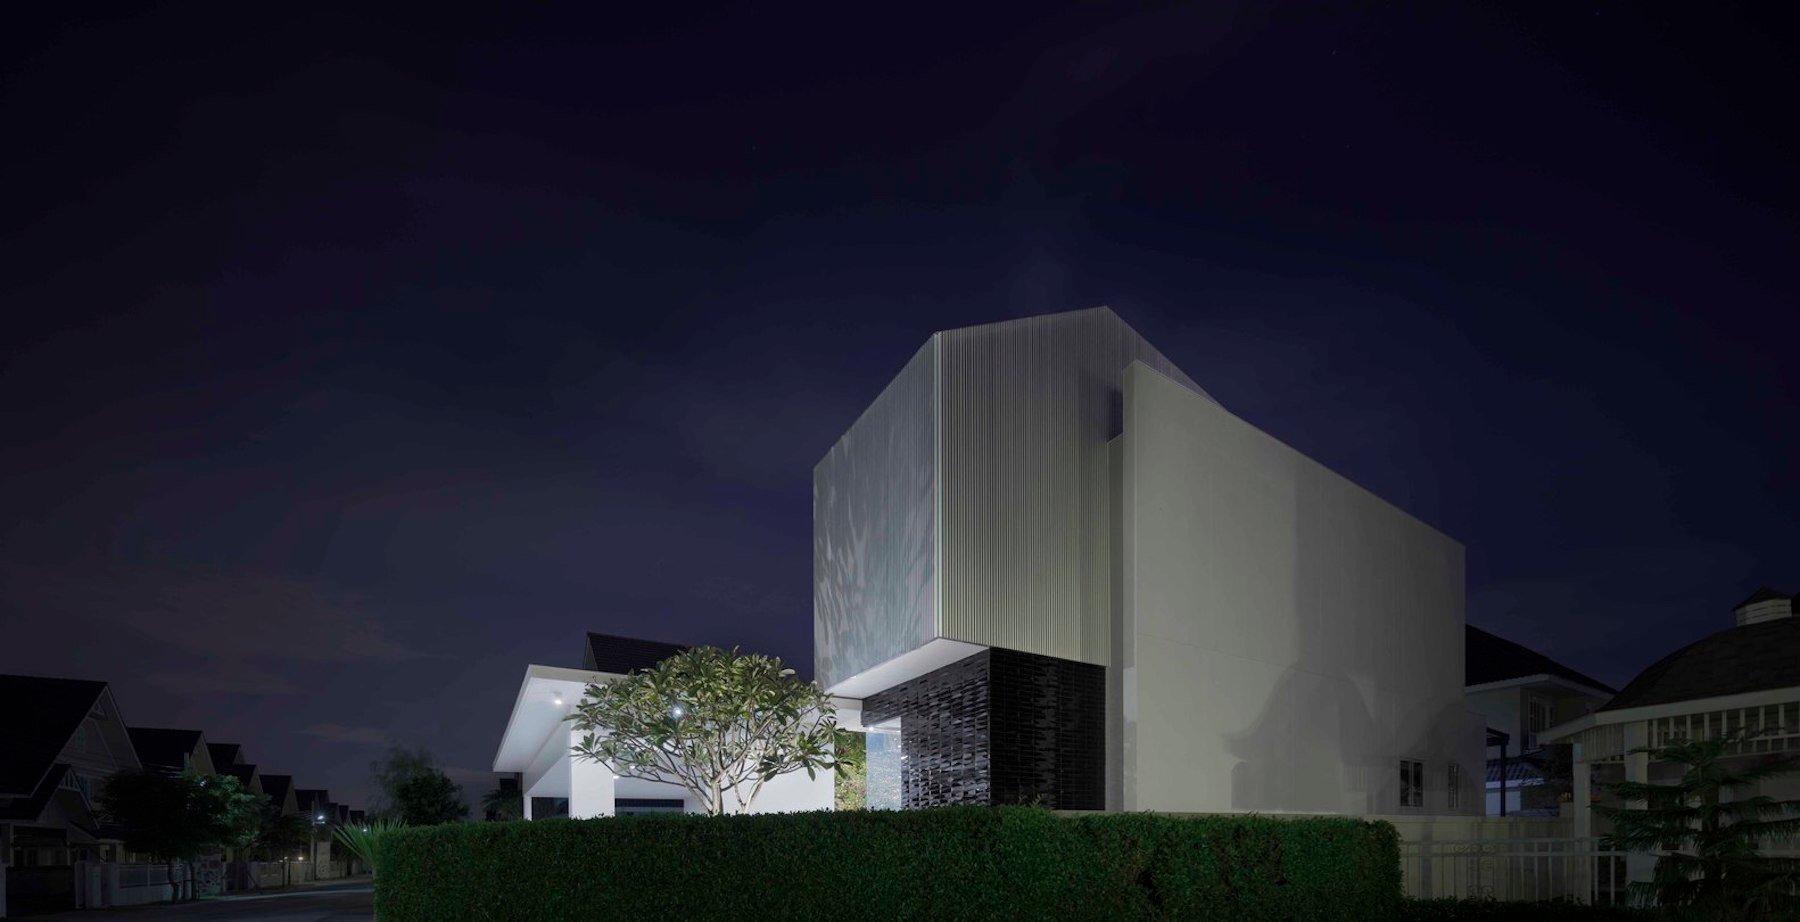 iGNANT-Architecture-Ayutt-And-Associates-Design-White-Box-House-10